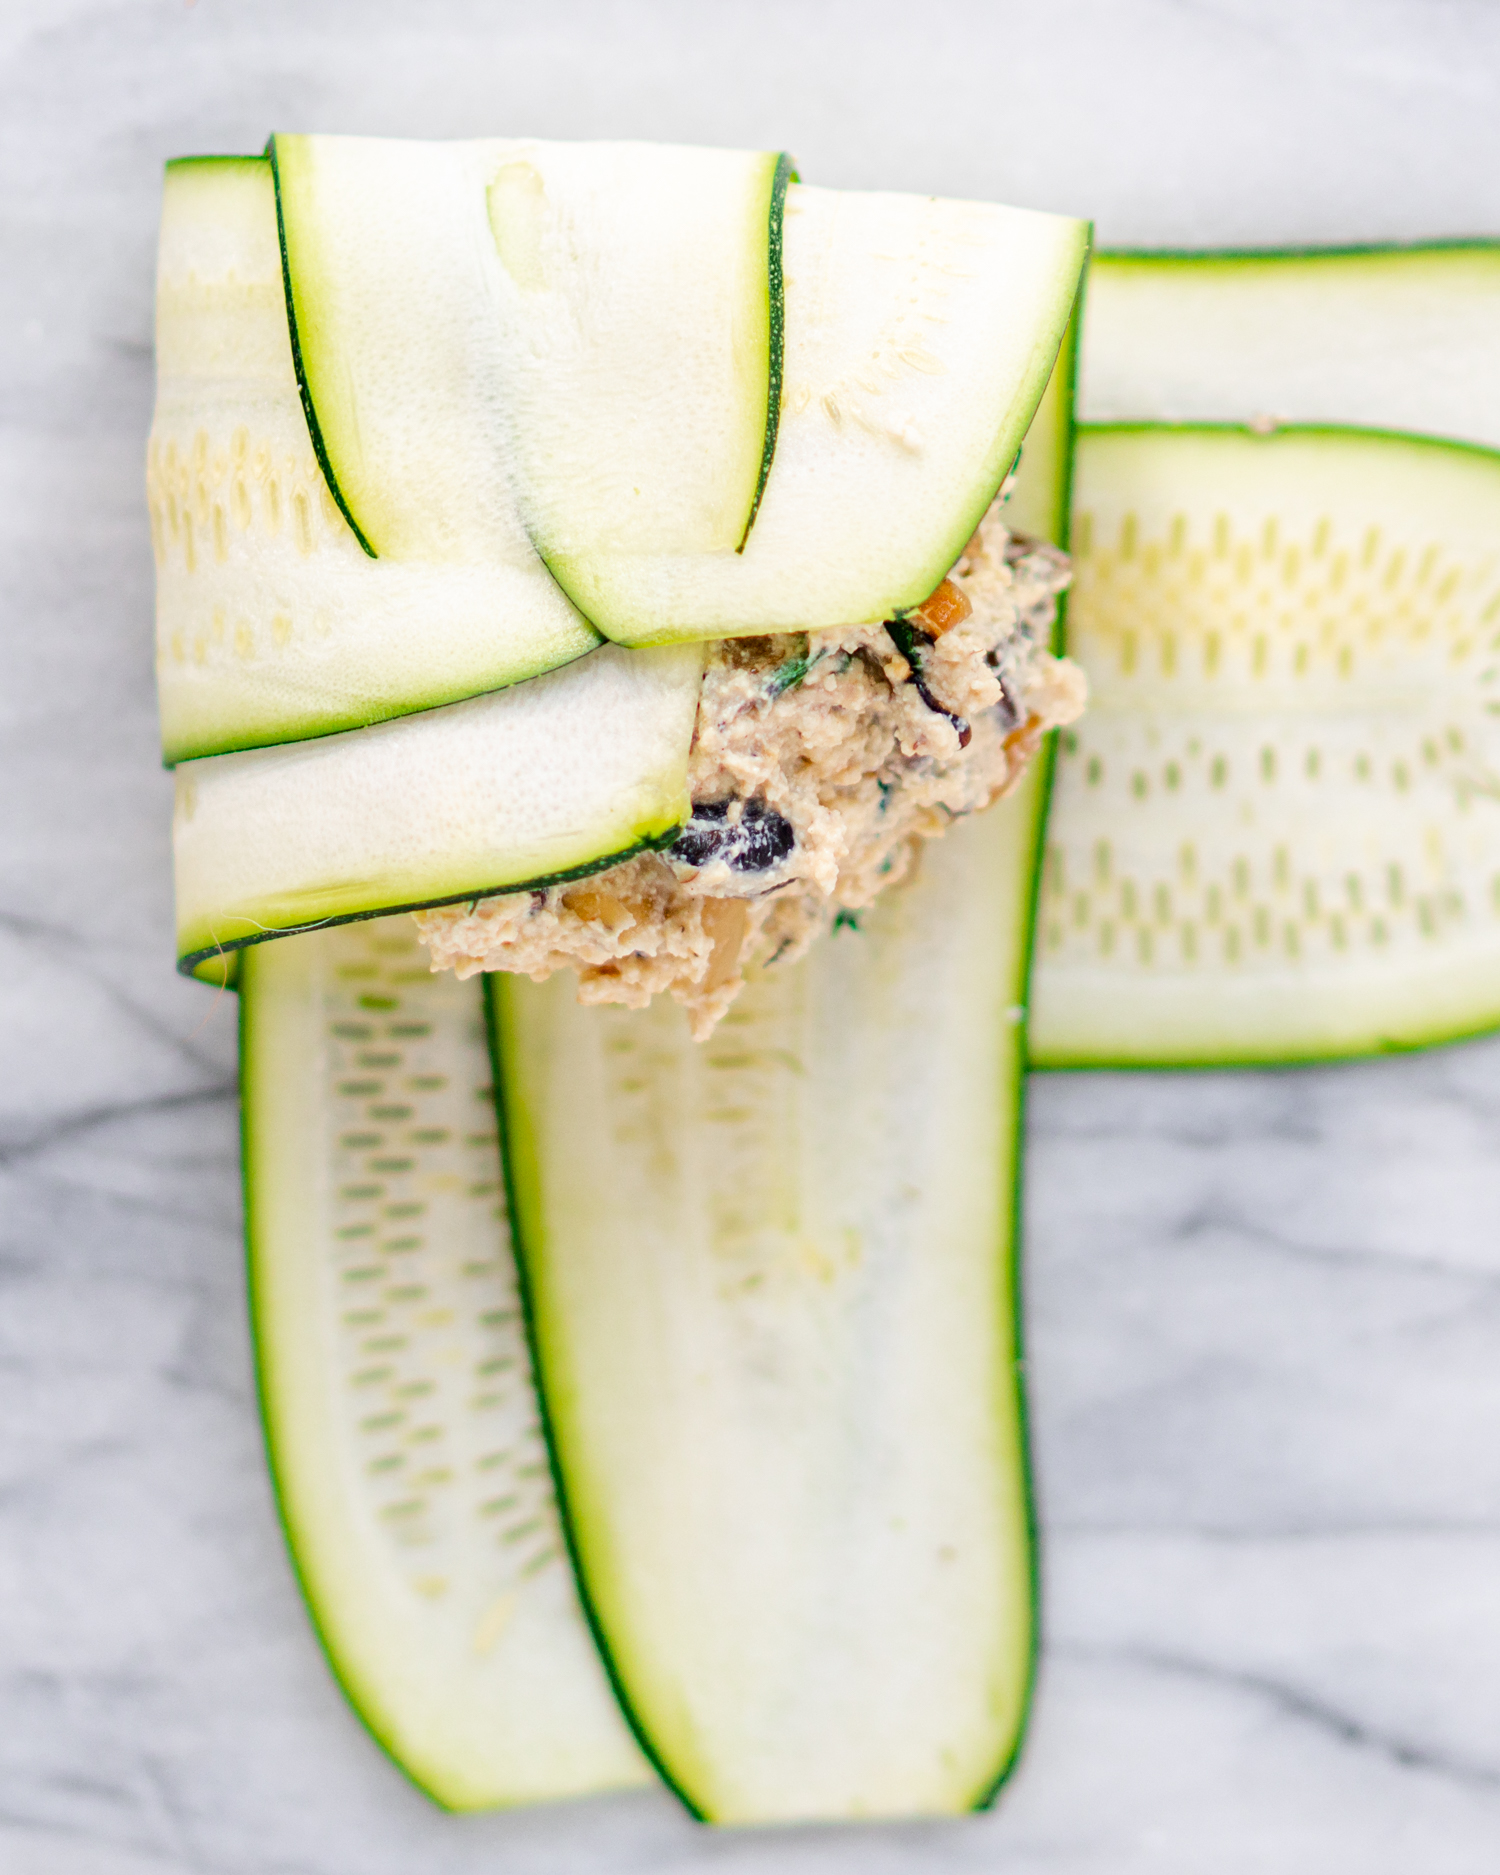 How to assemble zucchini ravioli